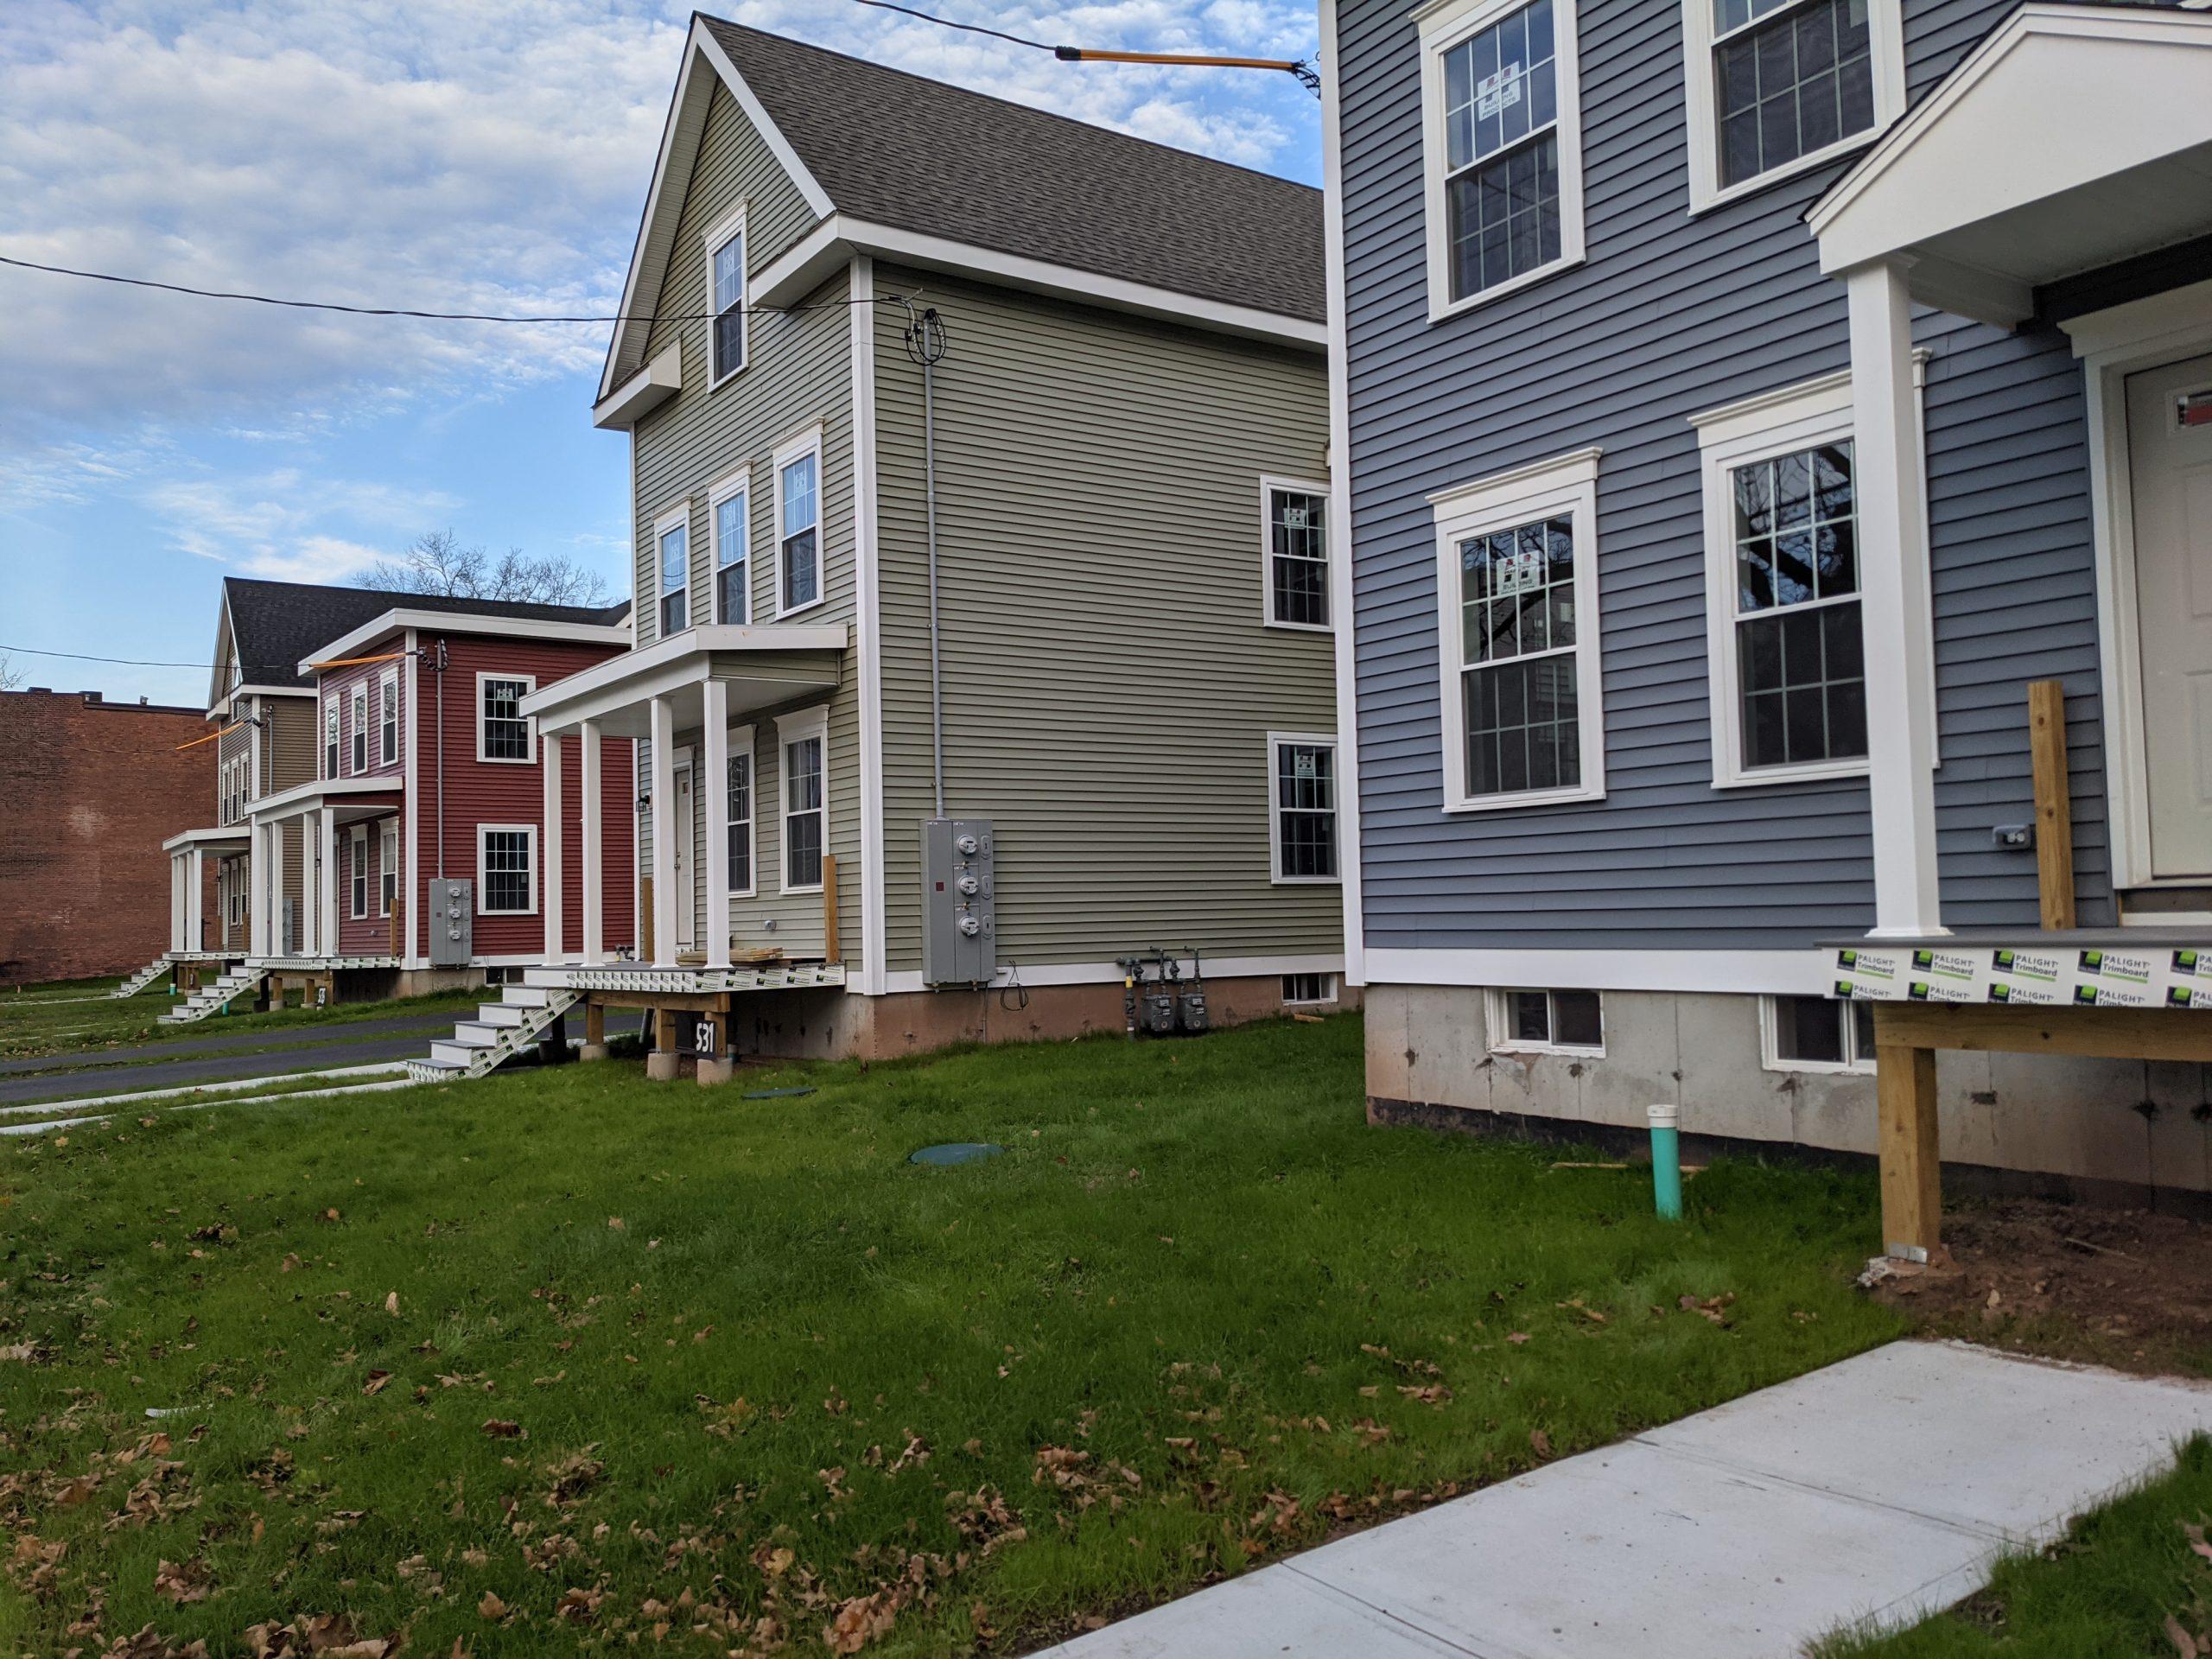 New Haven Housing Authority